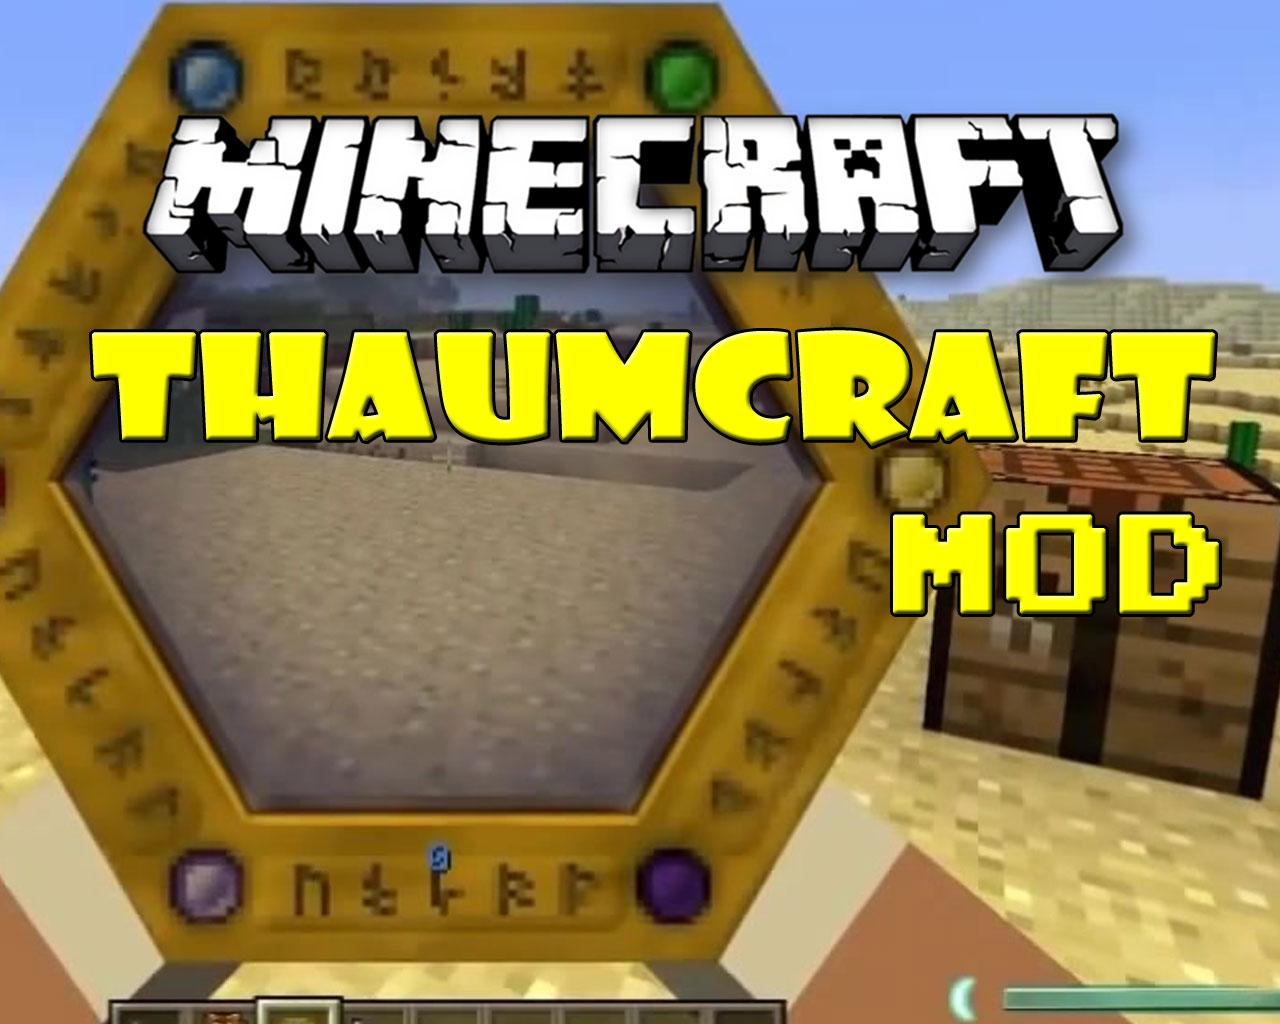 Thaumcraft Mod 1.12.2/1.10.2